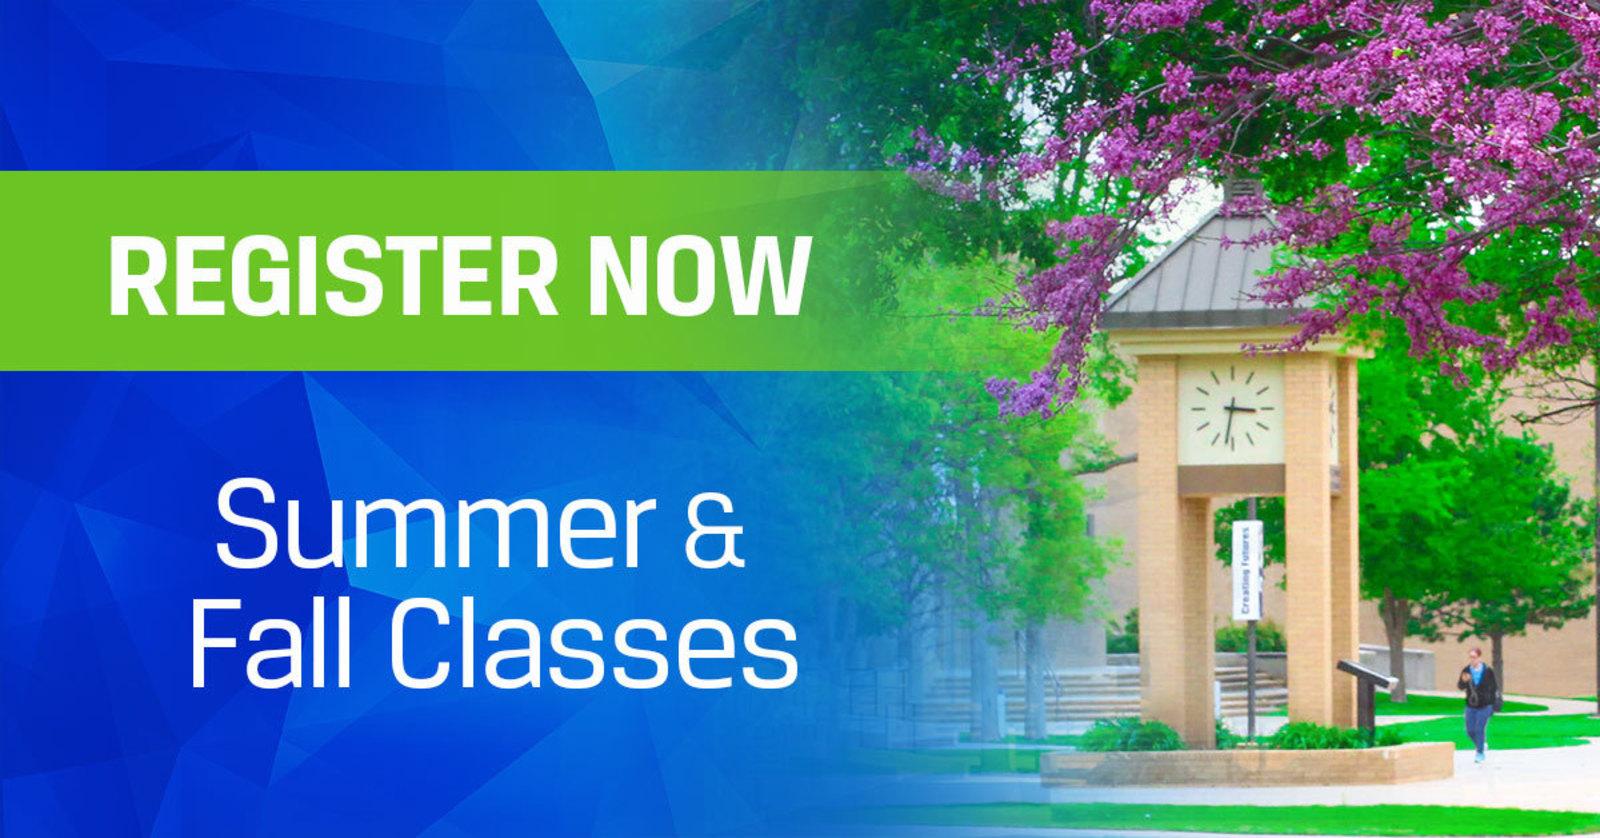 Register Now for Summer & Fall Classes